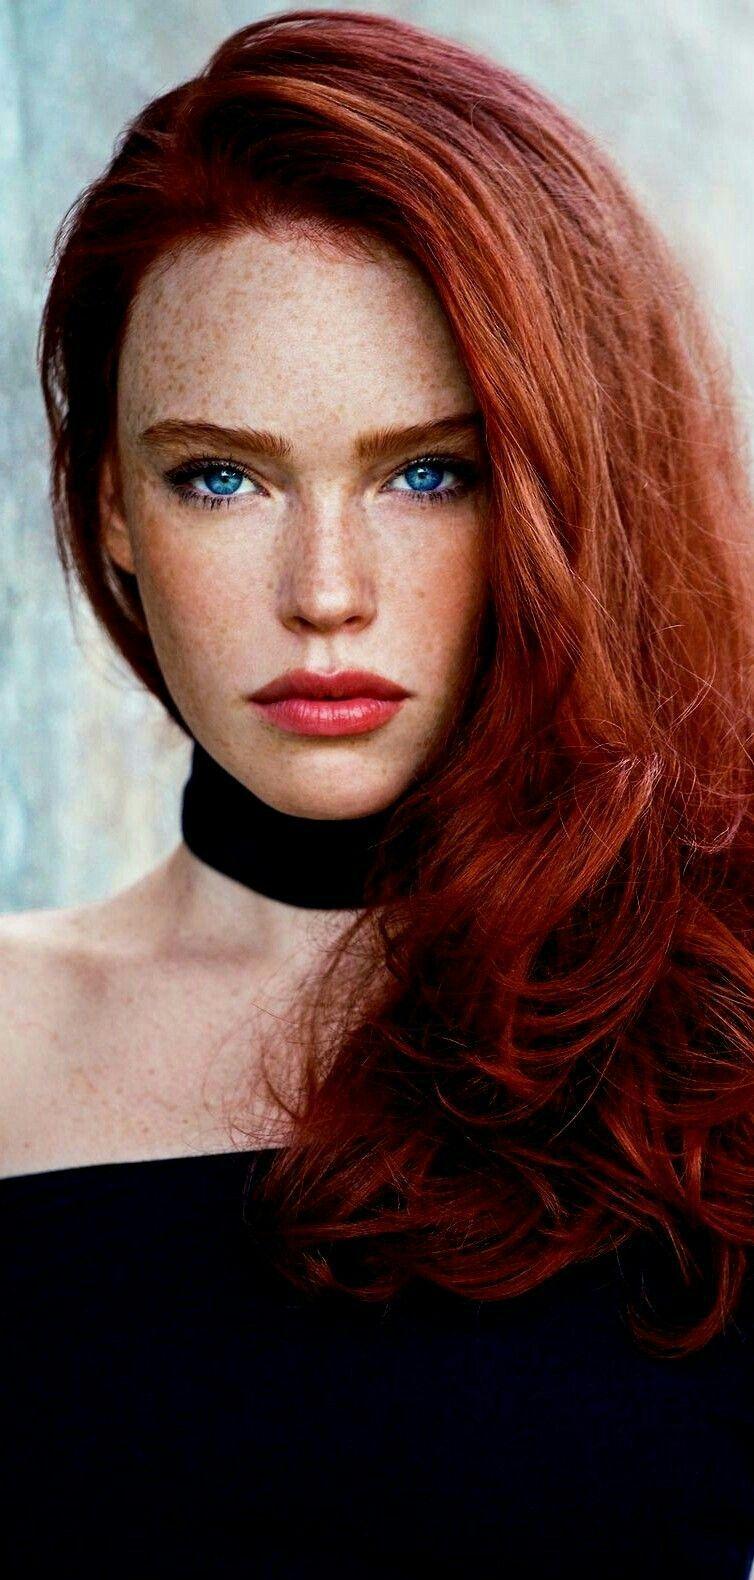 Redhead fashion photograph